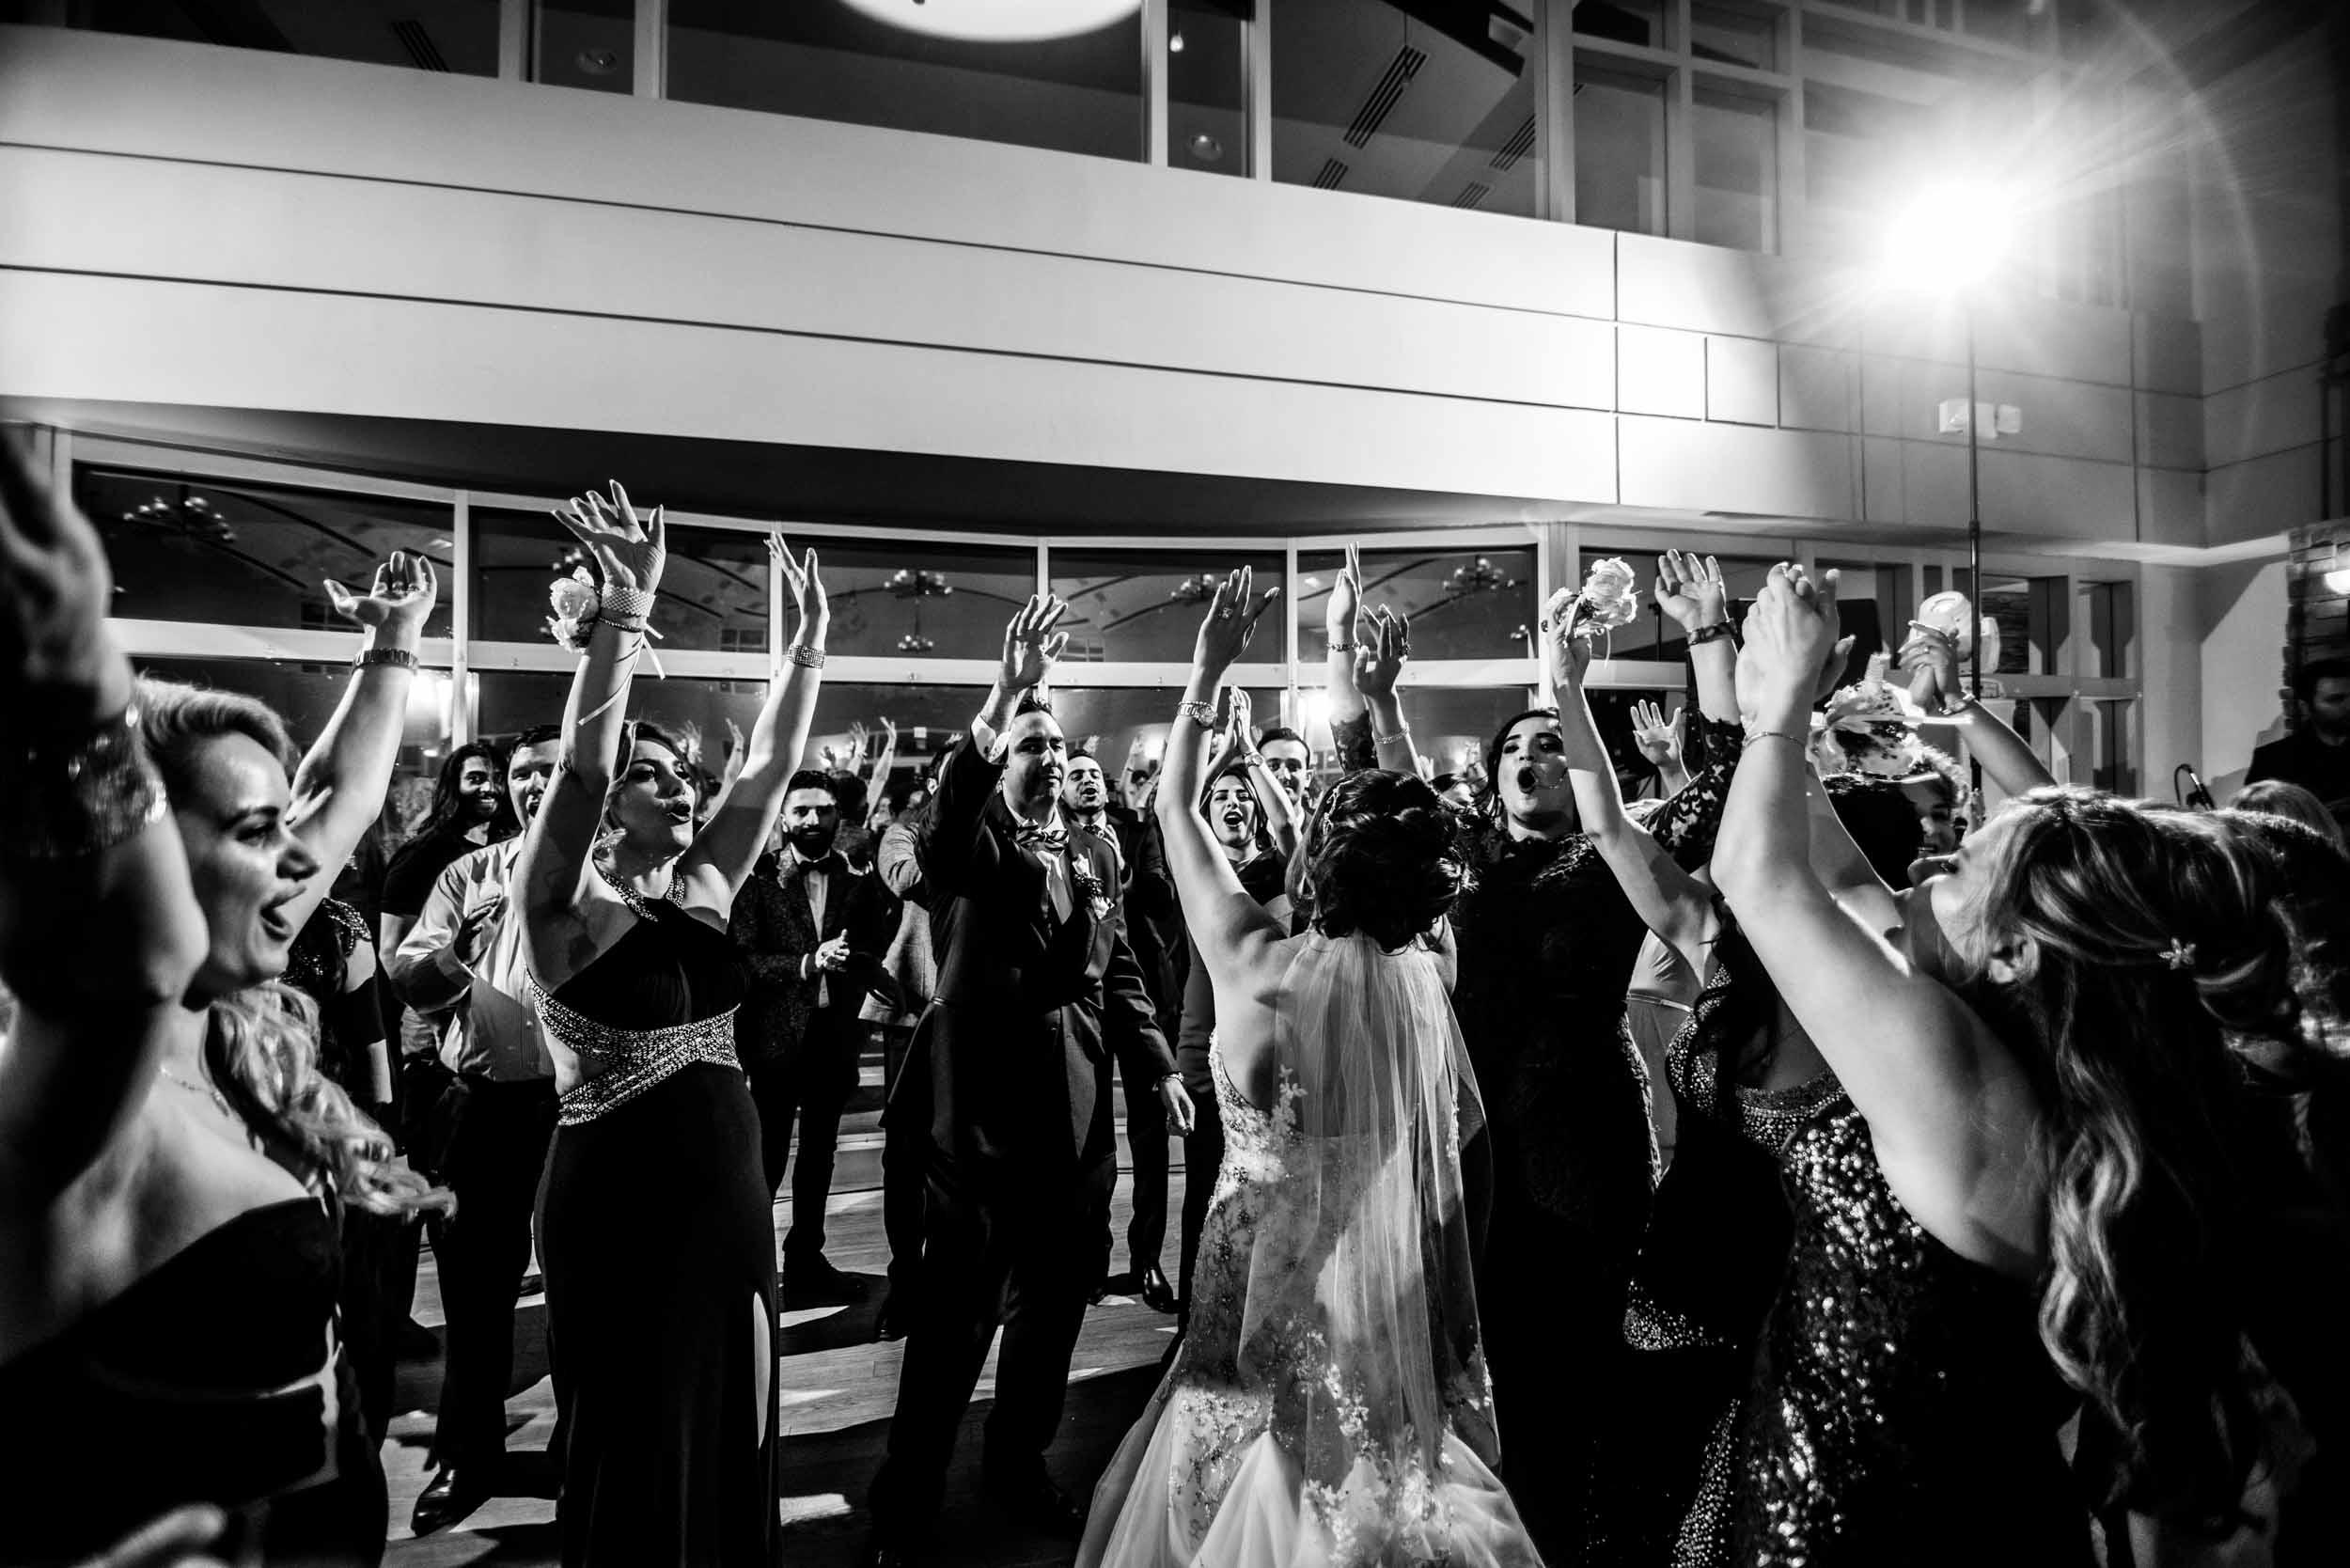 dc+metro+wedding+photographer+vadym+guliuk+photography+wedding+reception-2028.jpg